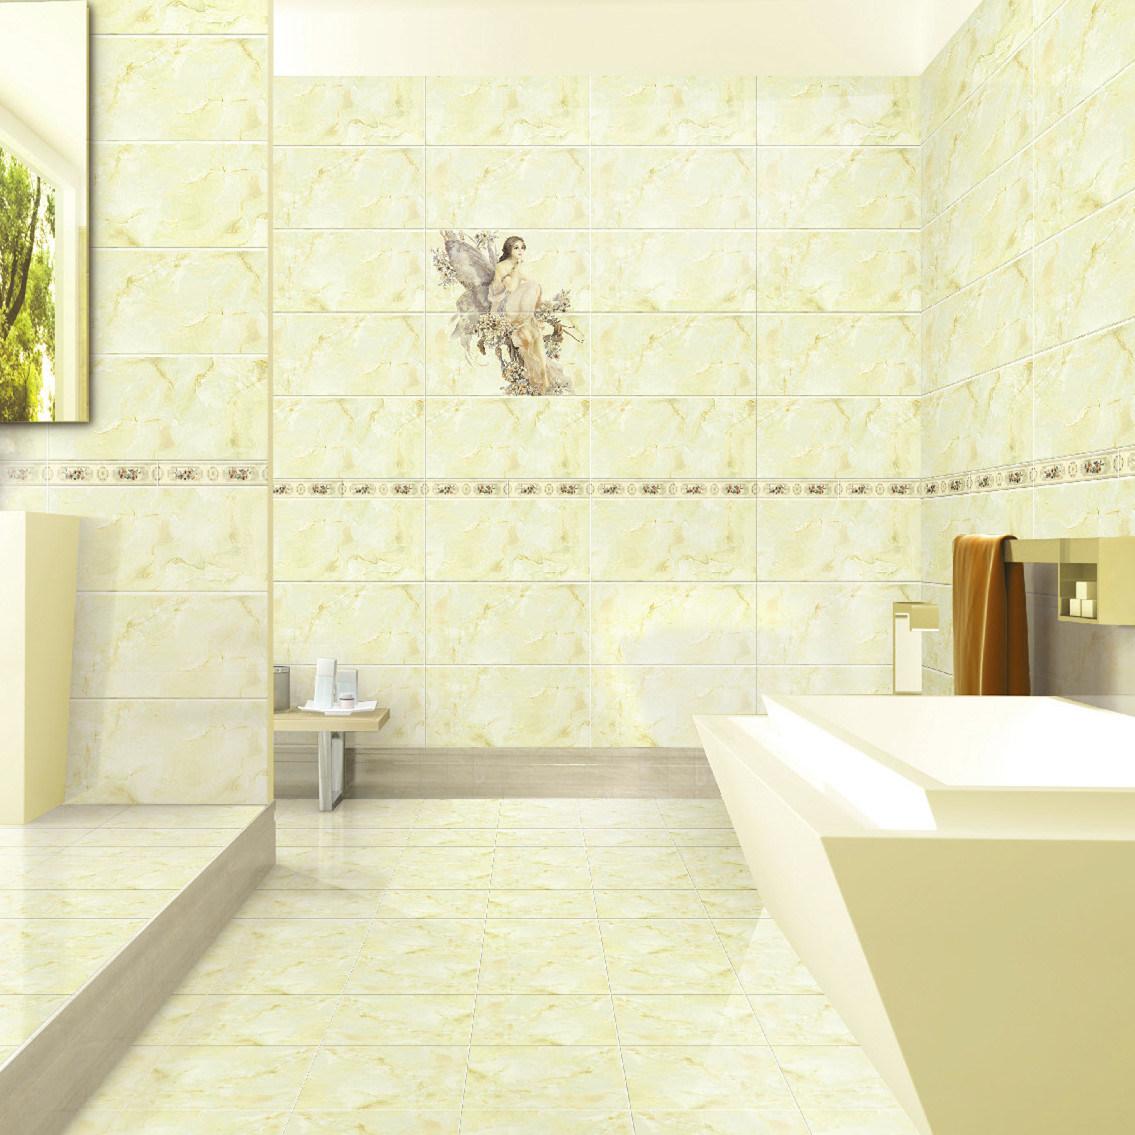 China Inkjet Glazed Ceramic 300X600mm Wall Tile for Bathroom or ...